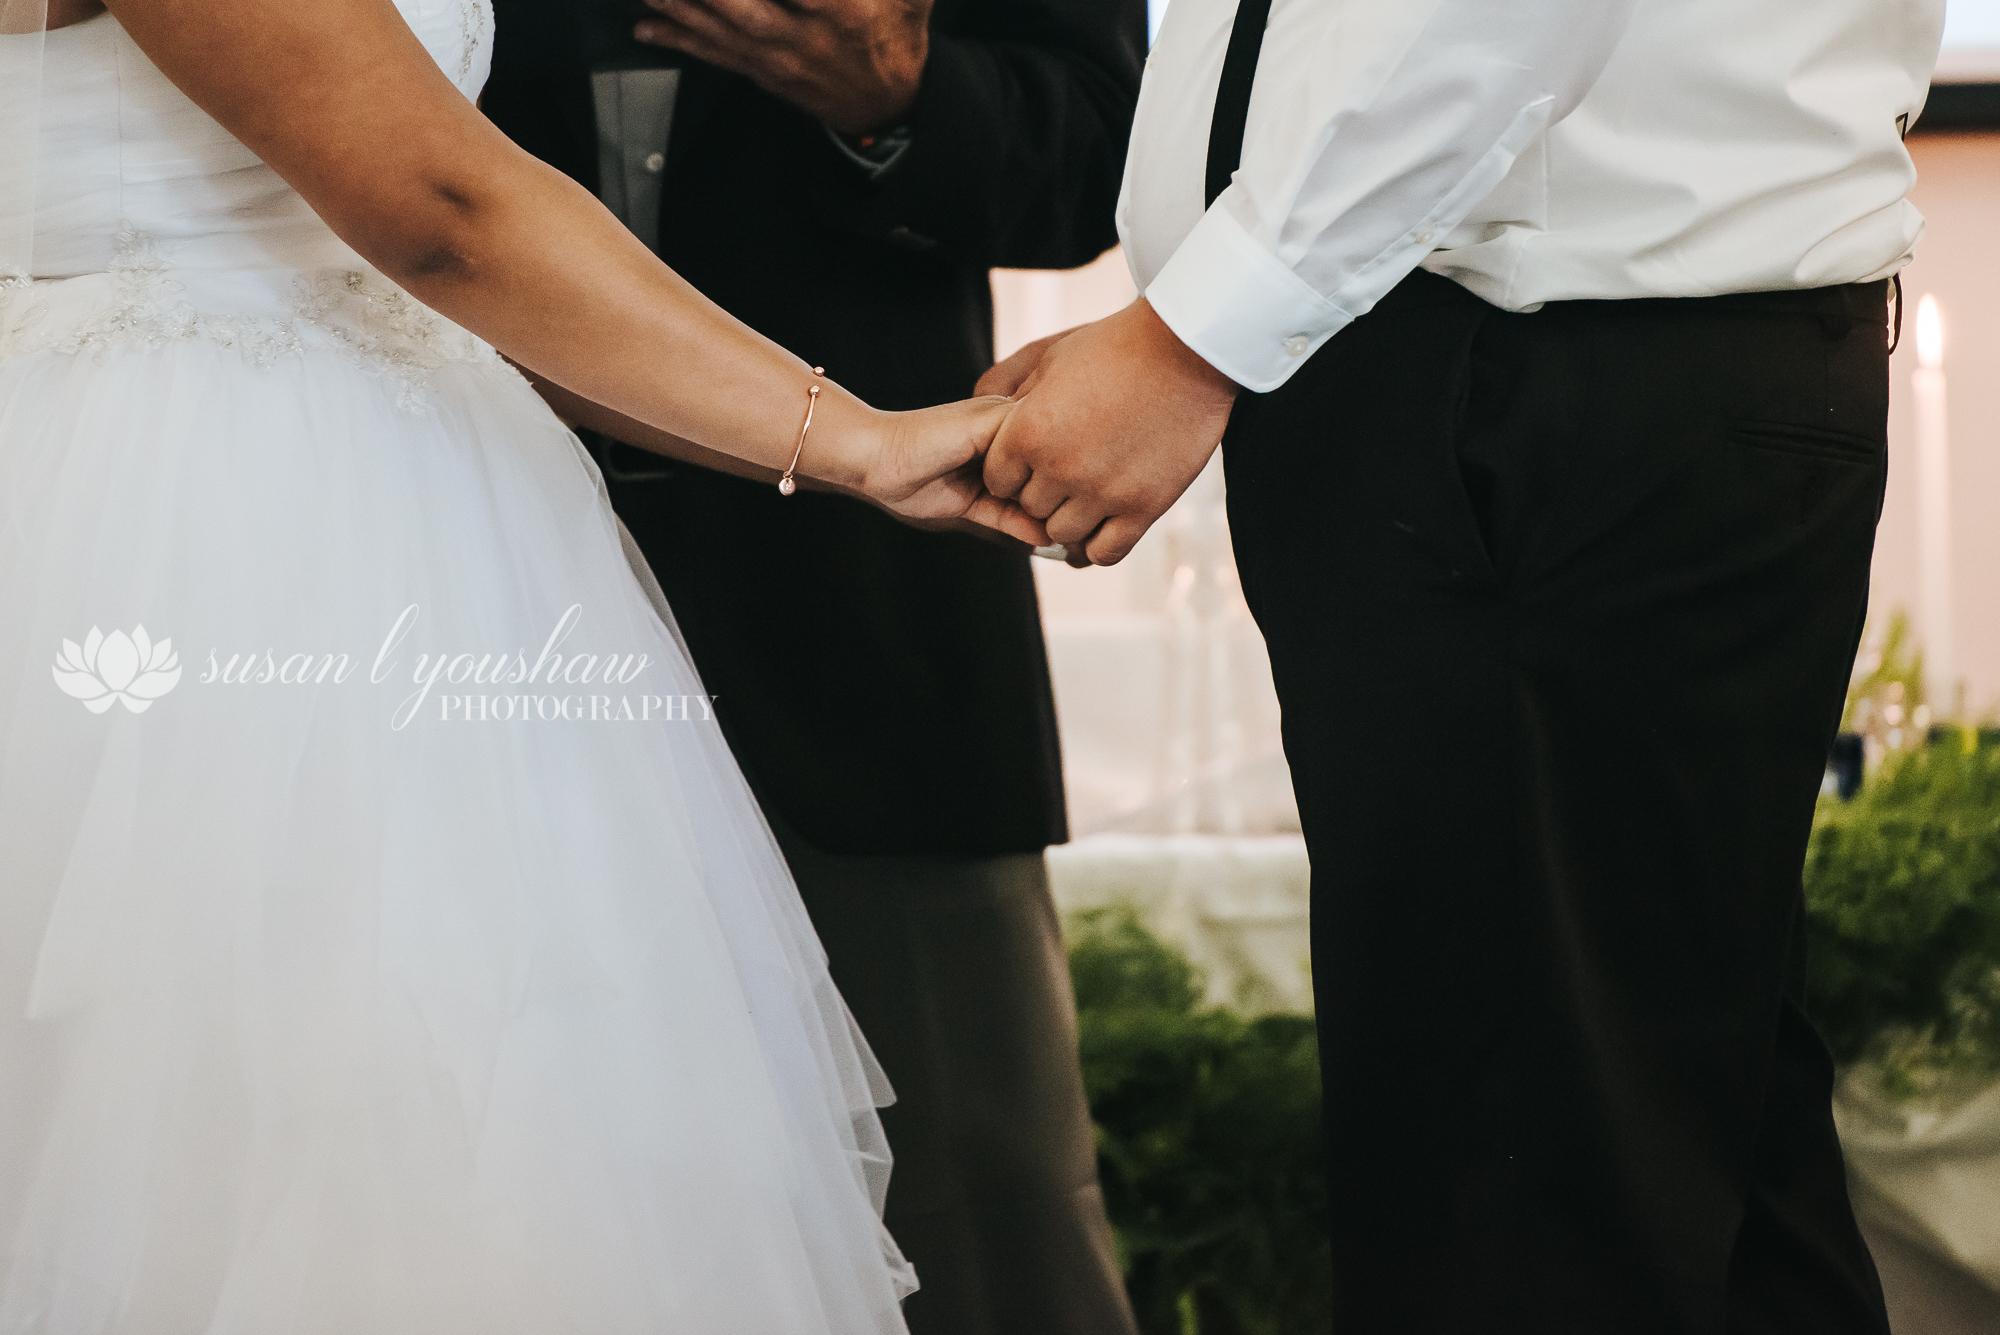 Katelyn and Wes Wedding Photos 07-13-2019 SLY Photography-66.jpg